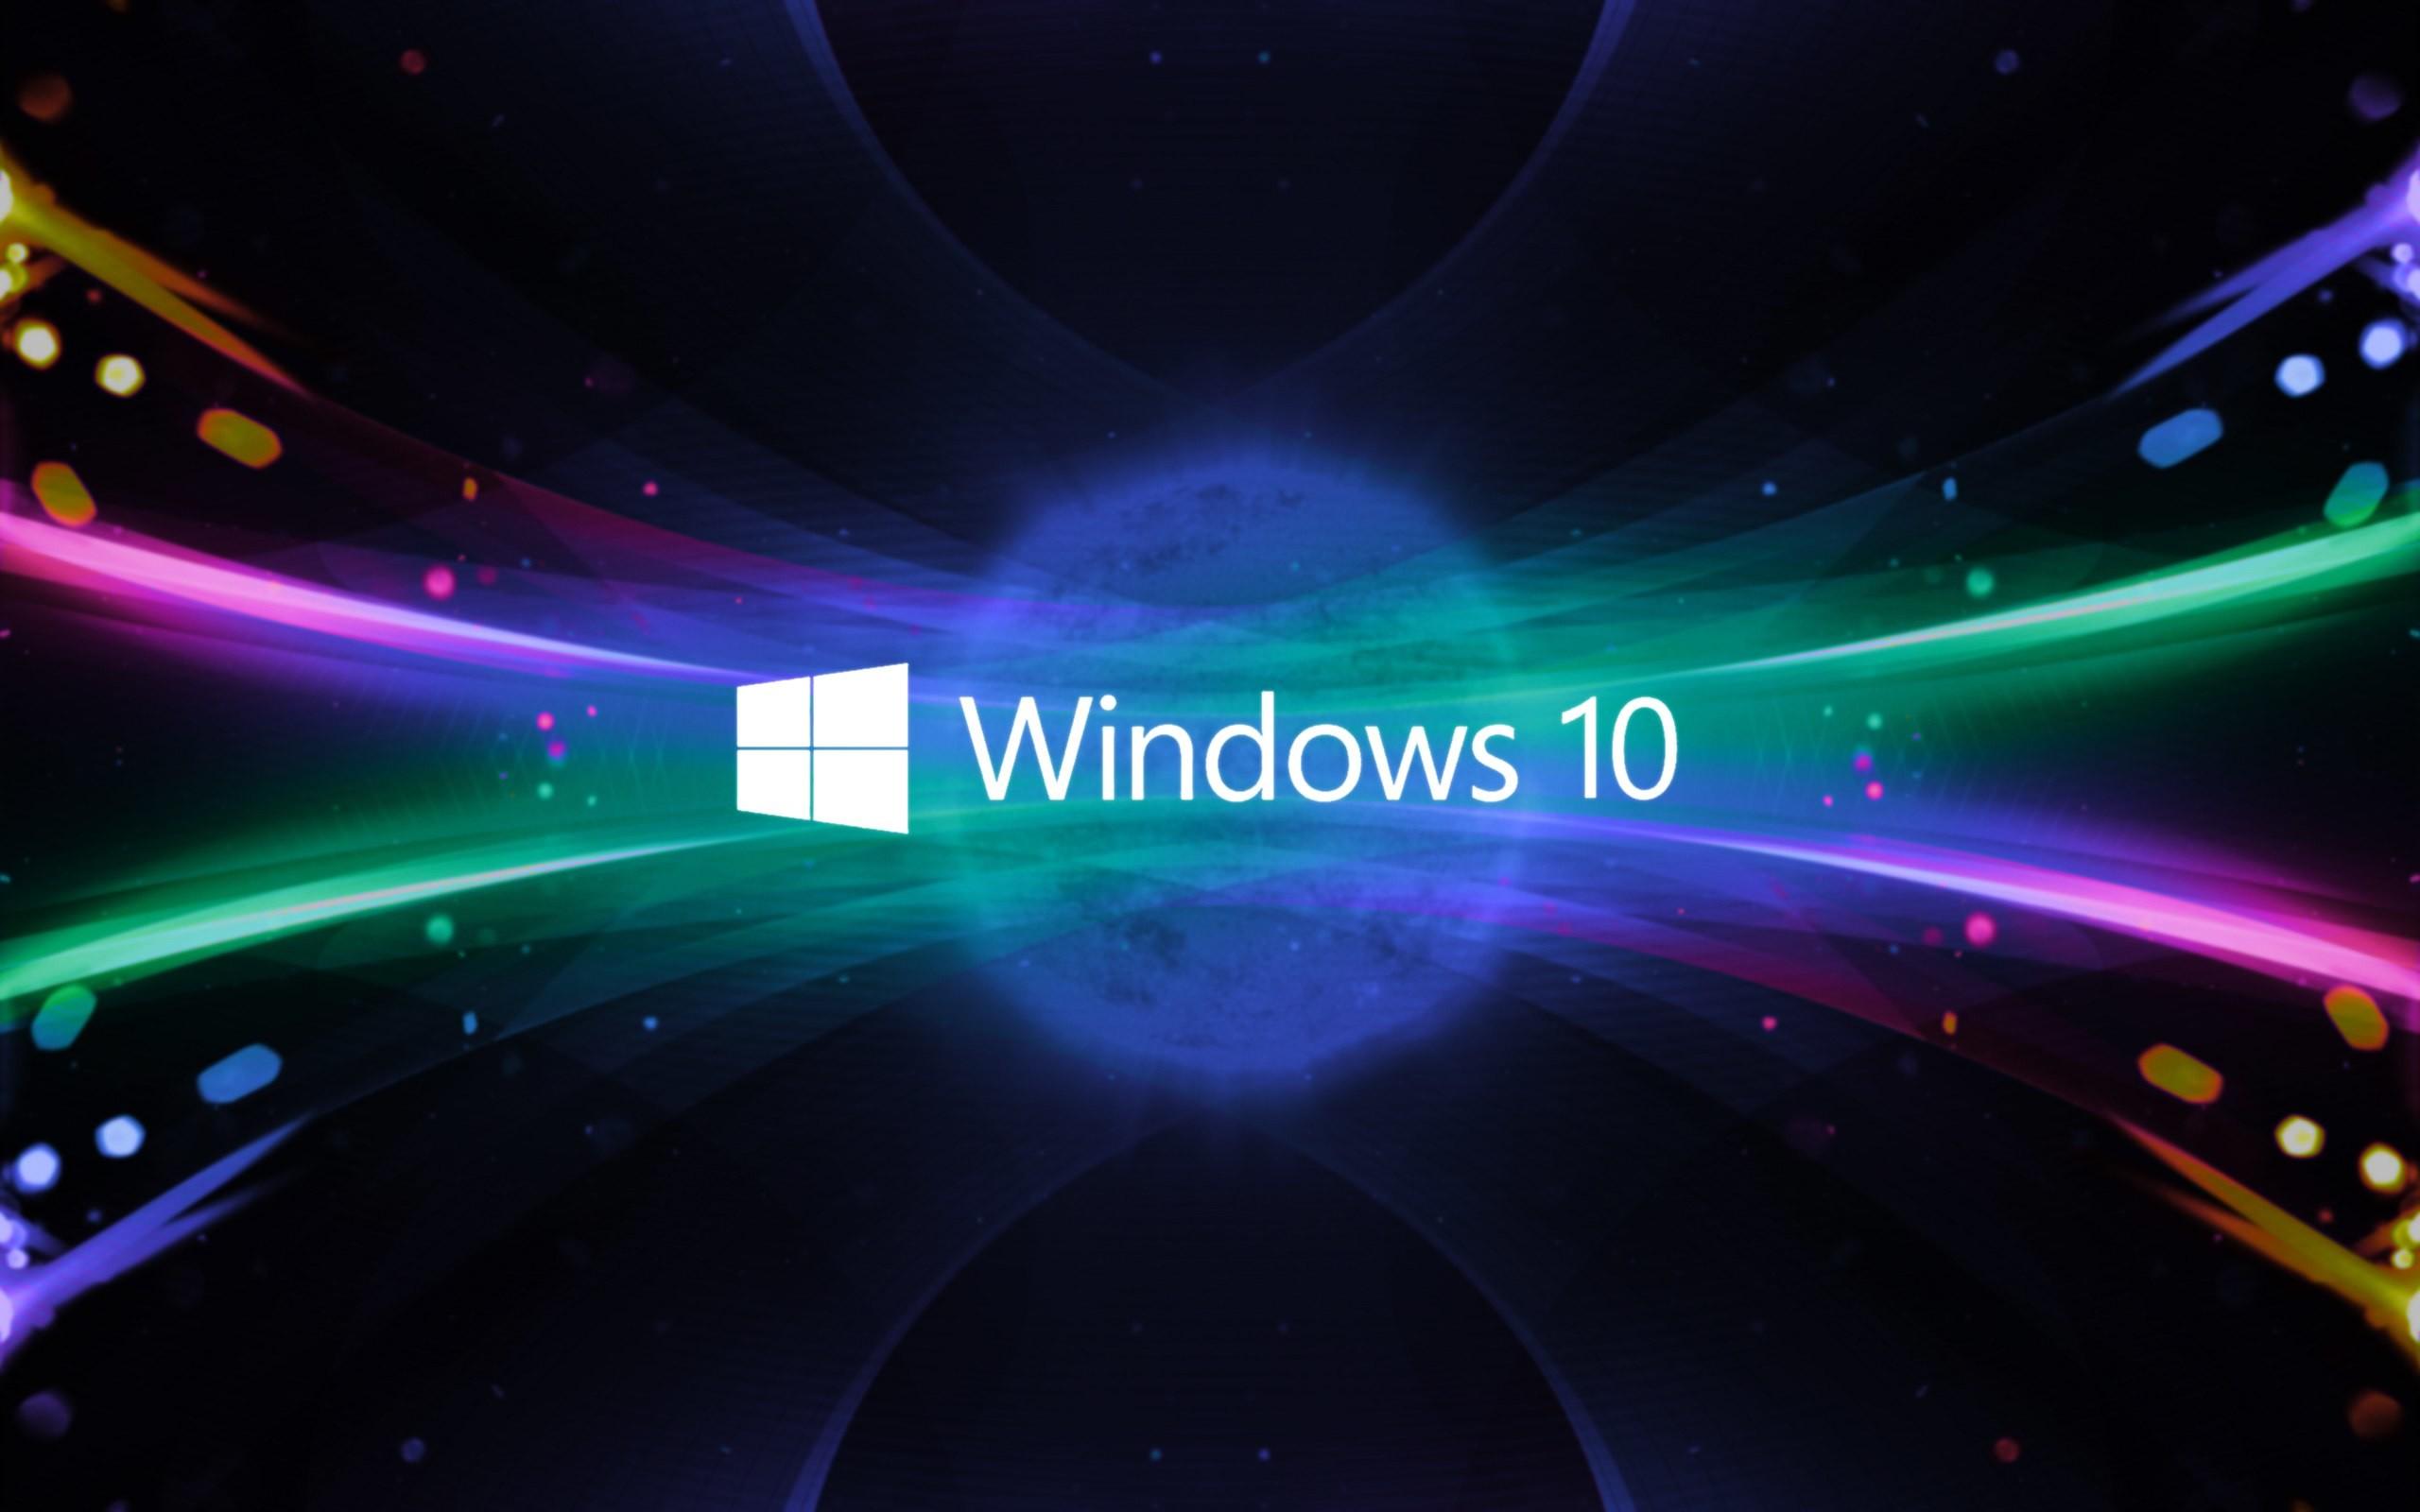 Windows live wallpaper hd download